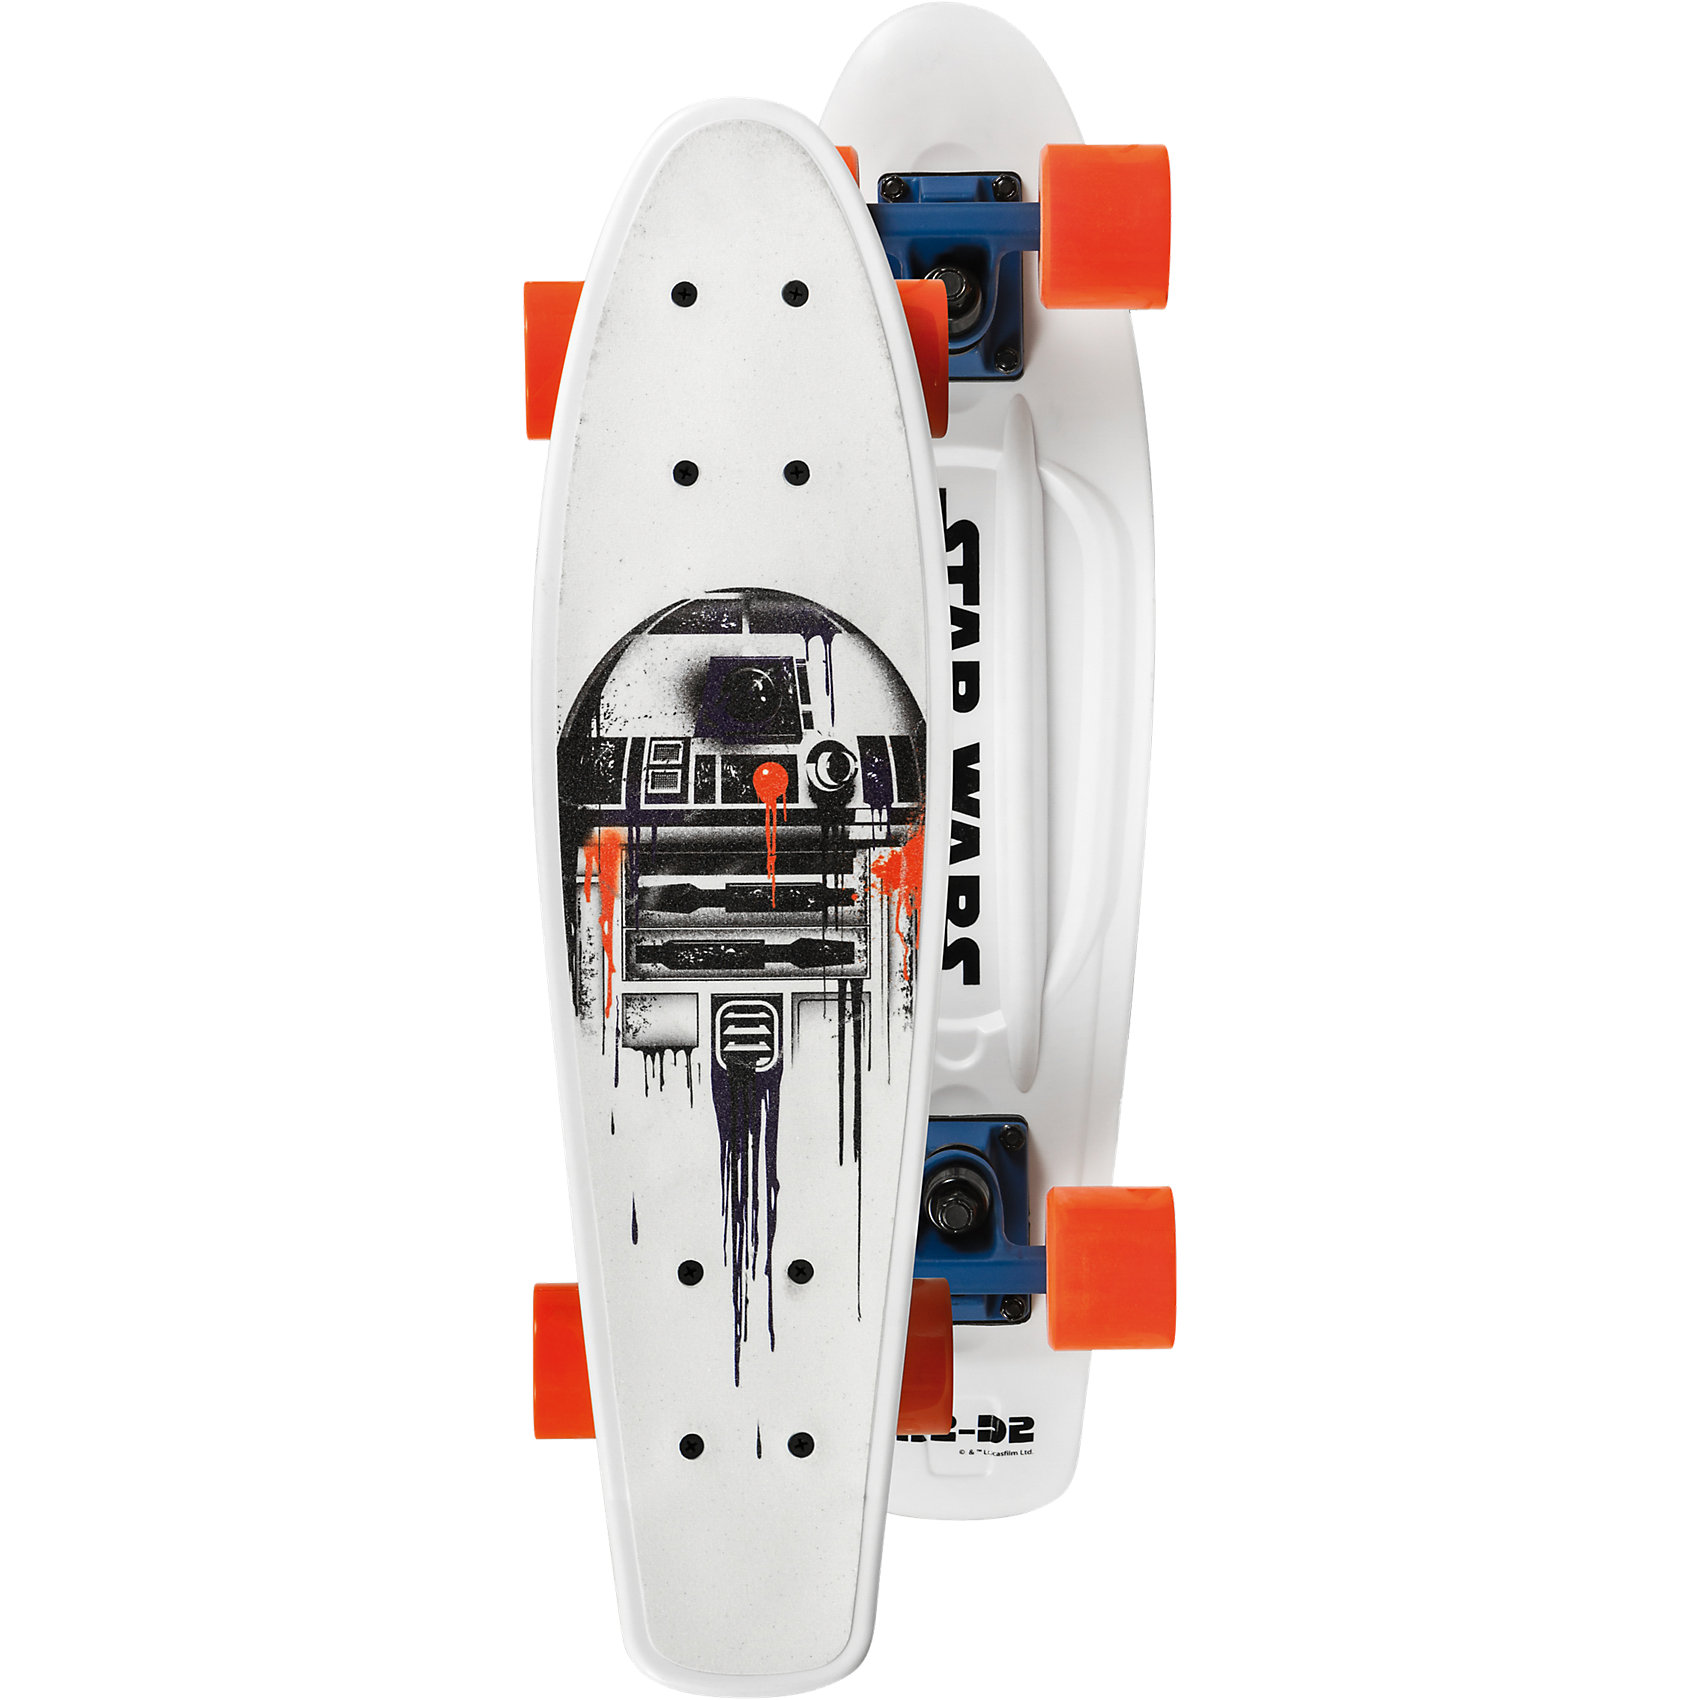 Neu Powerslide Star 6664415 Wars Skateboard Fading R2D2 6664415 Star weiß 72911c